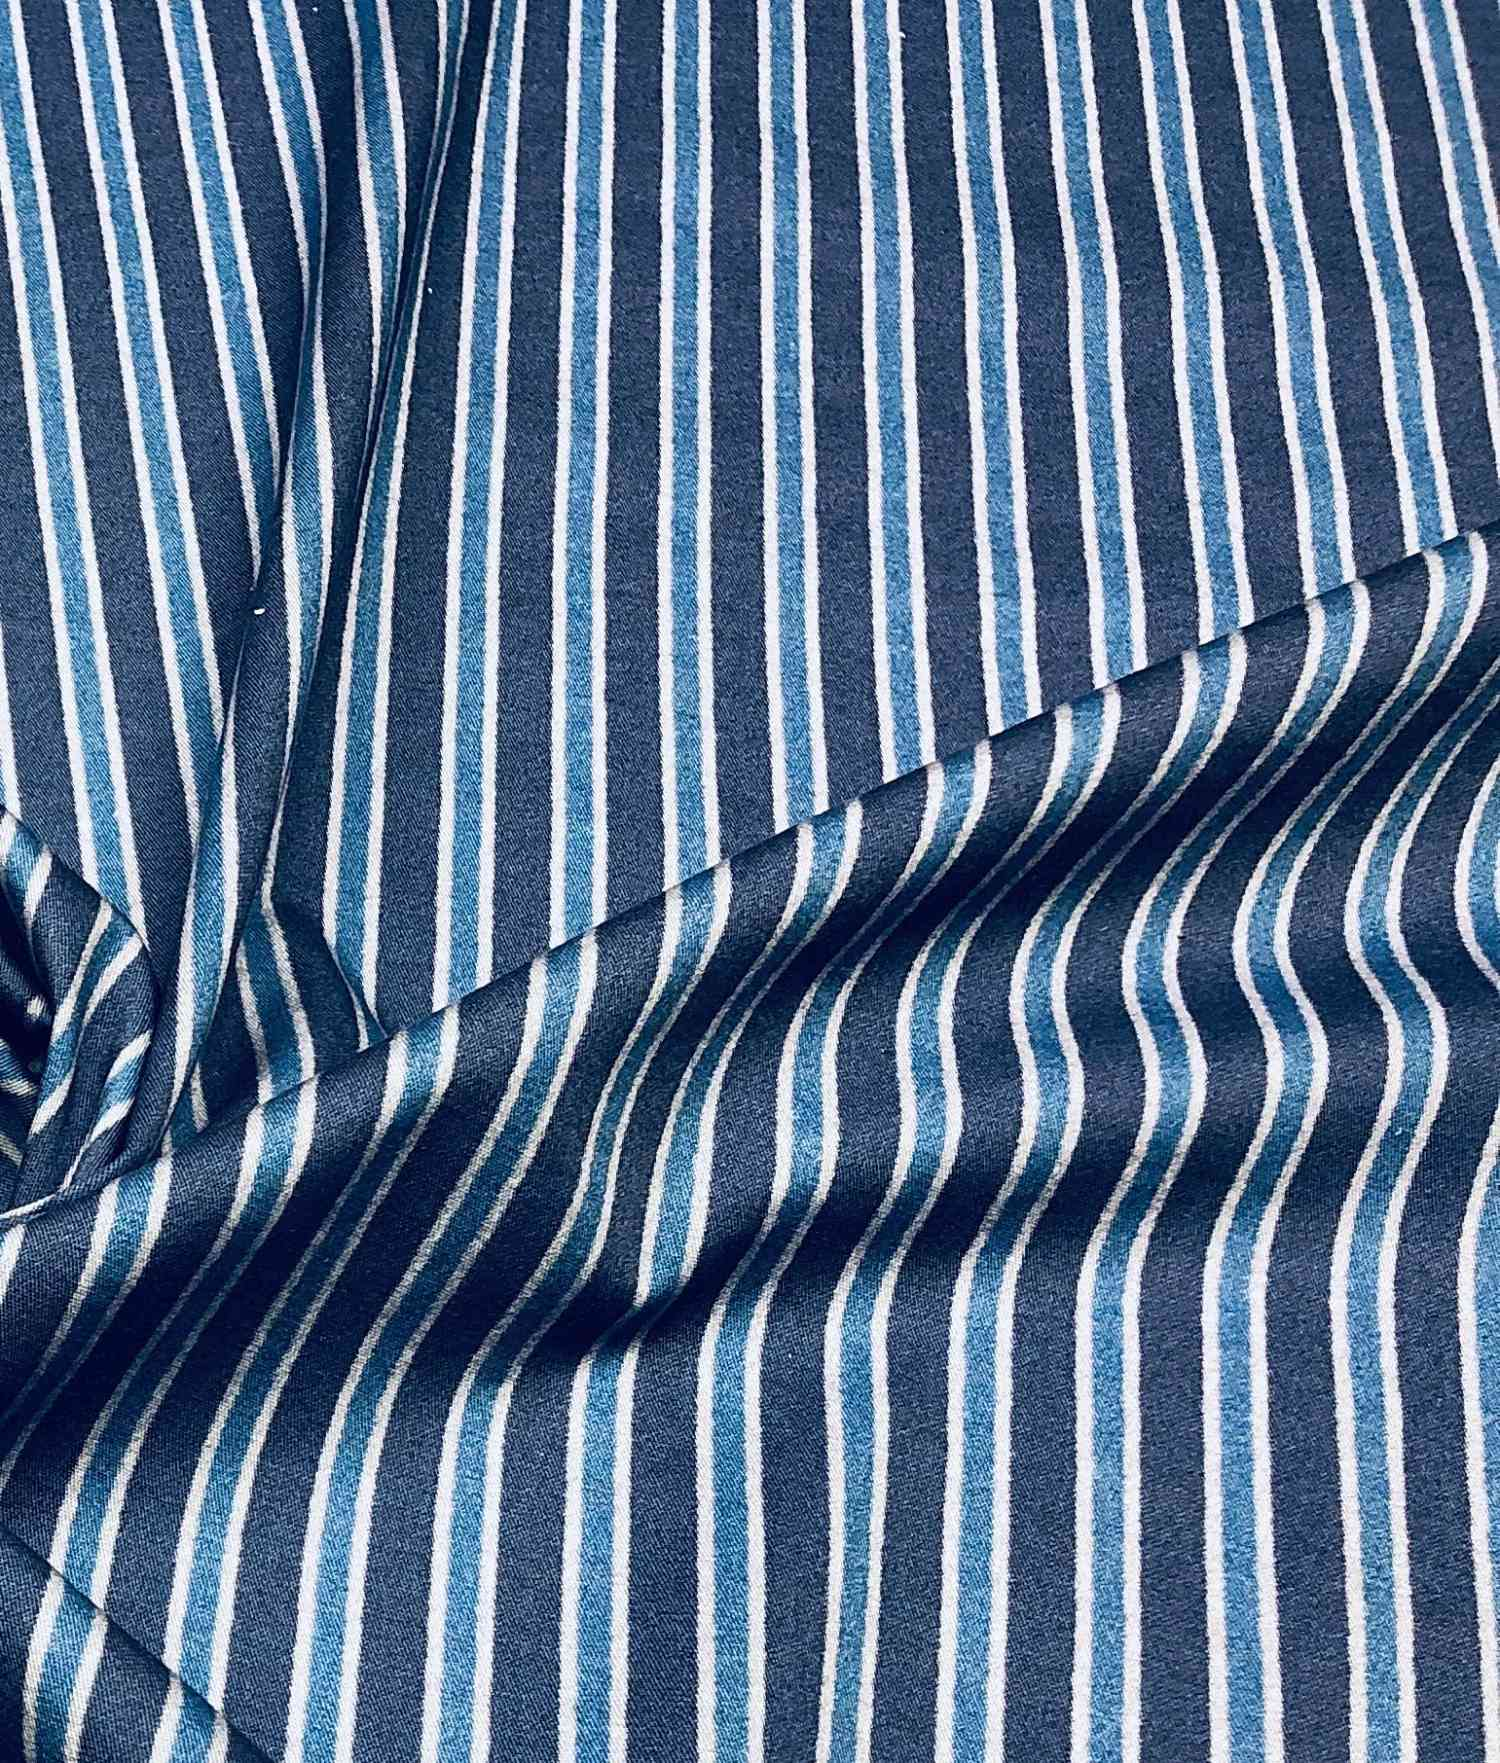 Printed Fabrics - levantina - LEVANTINA Cotton Elastan